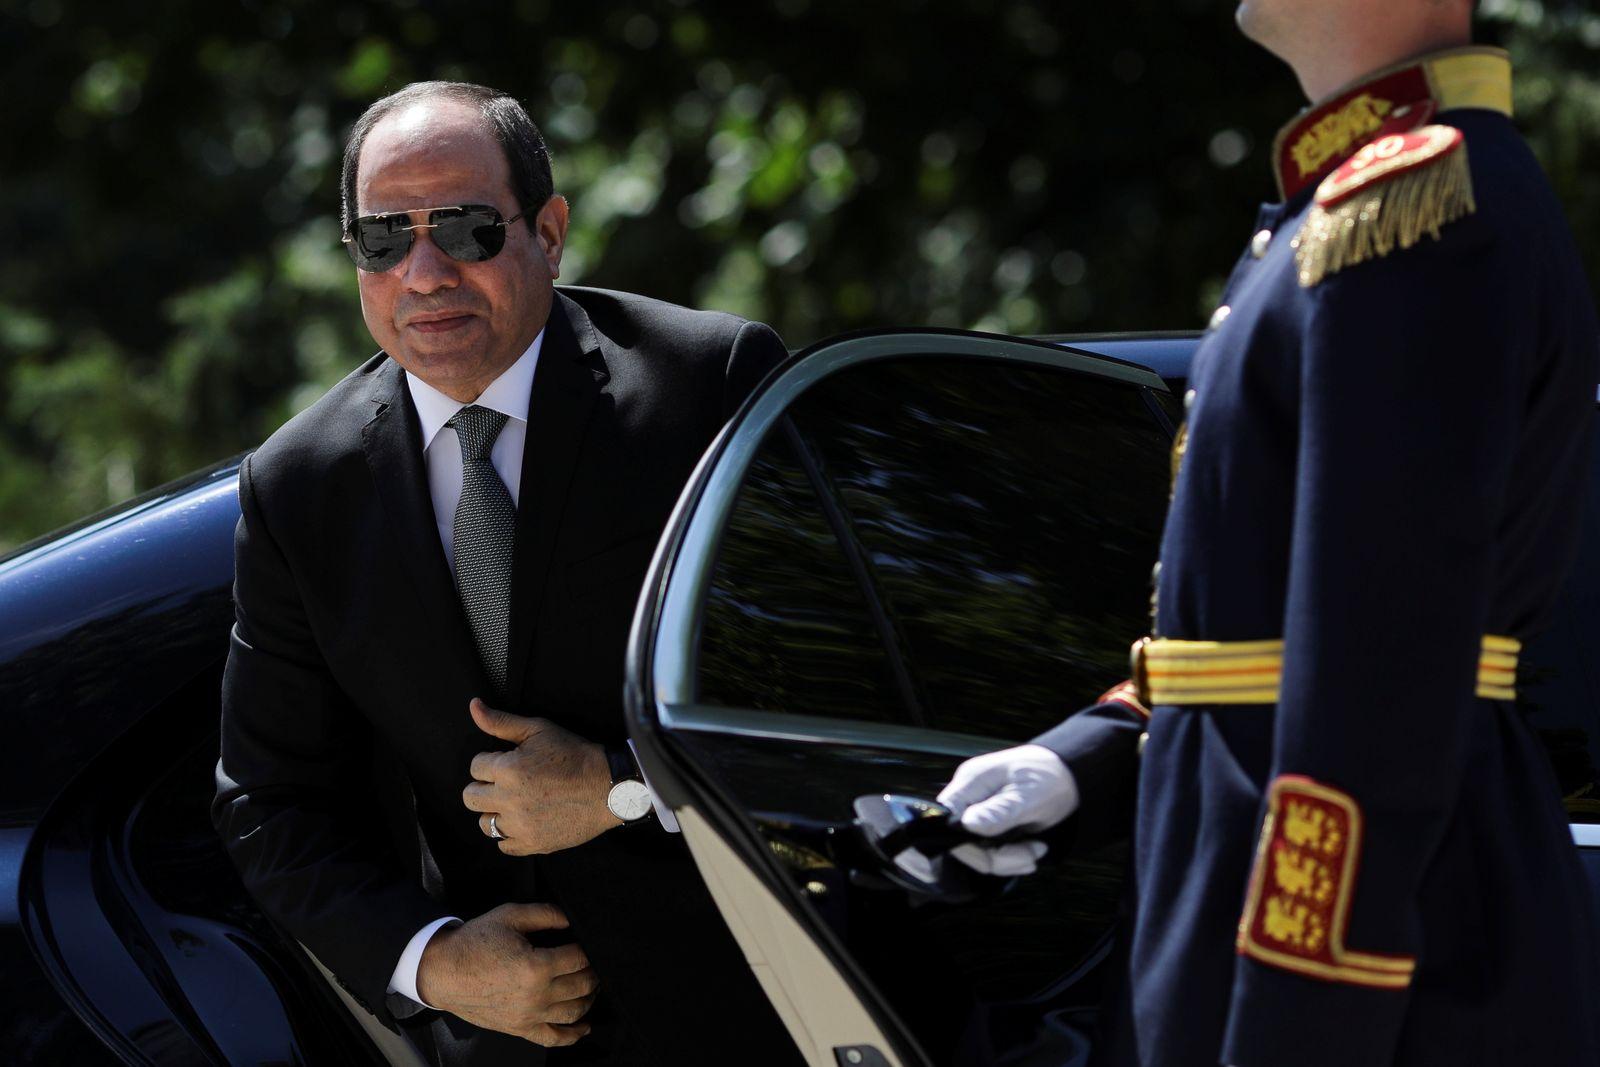 Egyptian President Abdel Fattah al-Sisi visits Romania